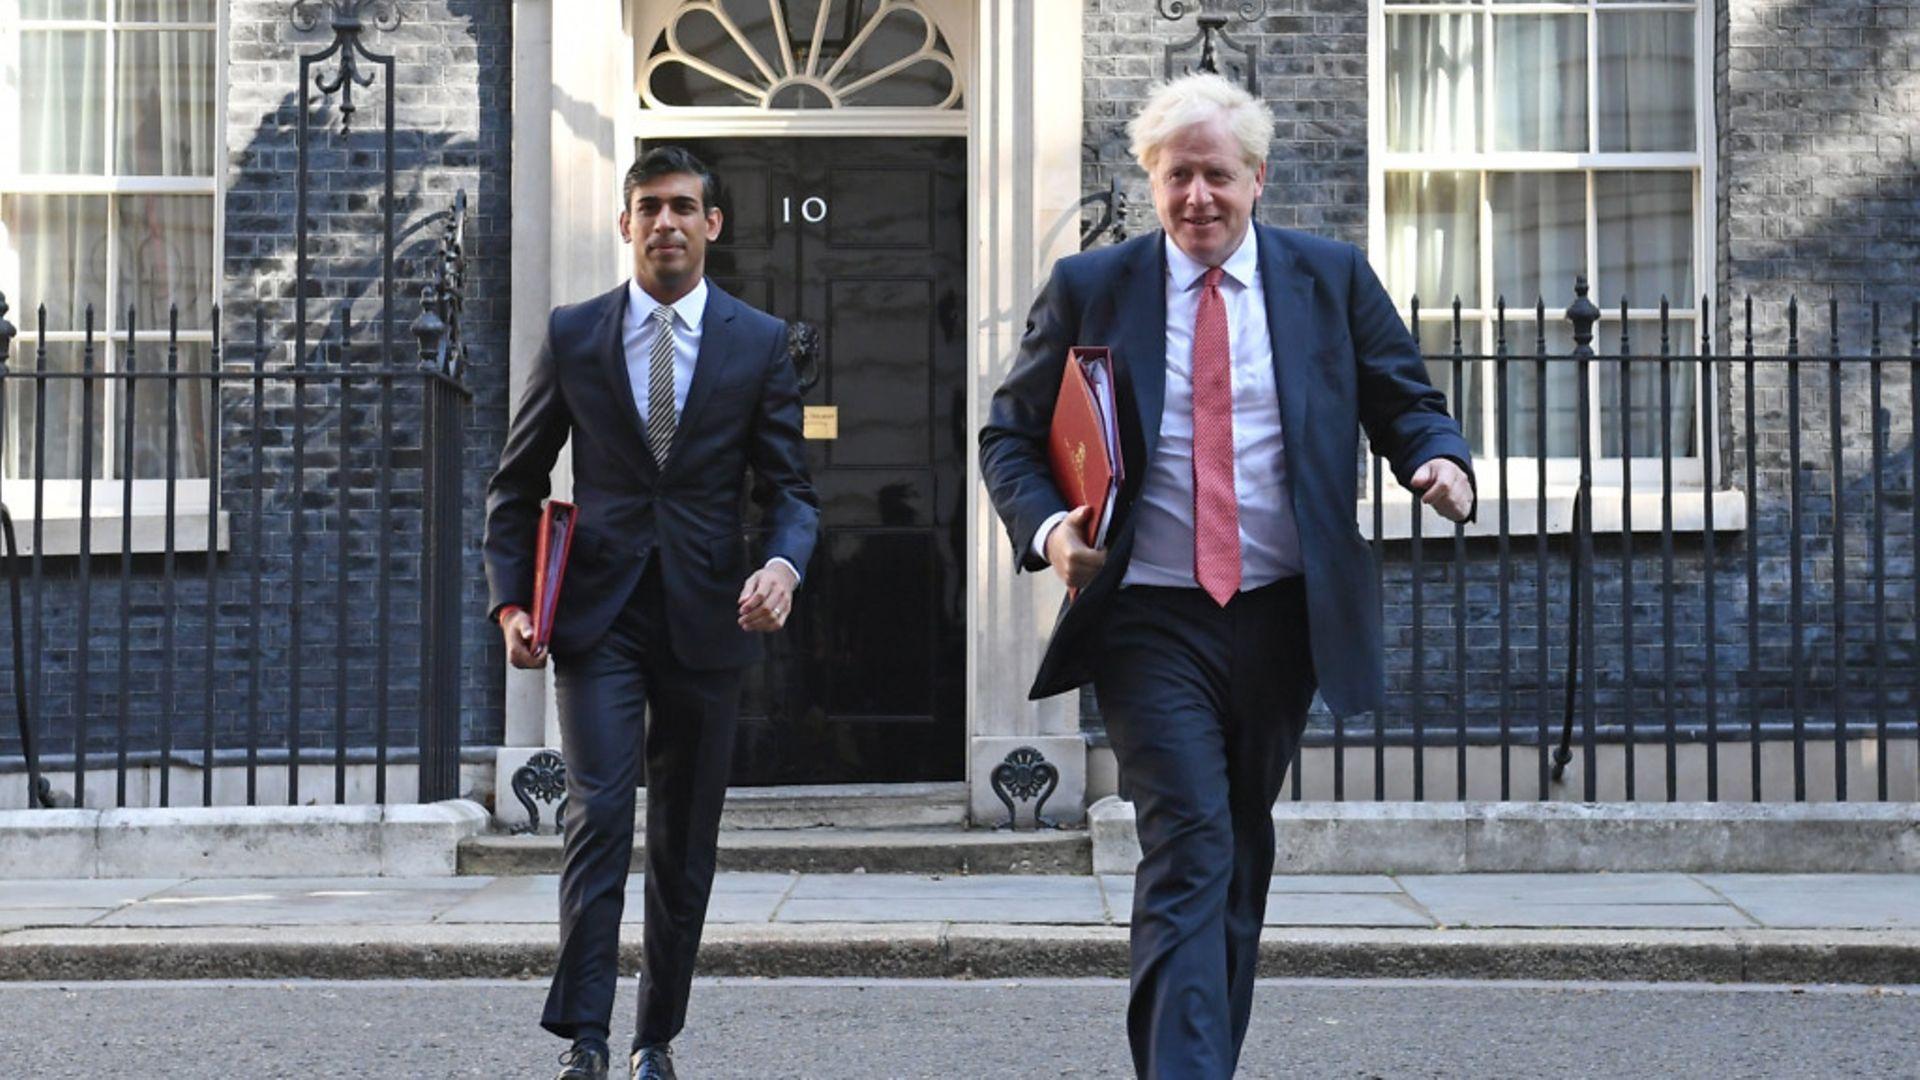 Chancellor Rishi Sunak (L) and prime minister Boris Johnson leave 10 Downing Street - Credit: Stefan Rousseau/PA